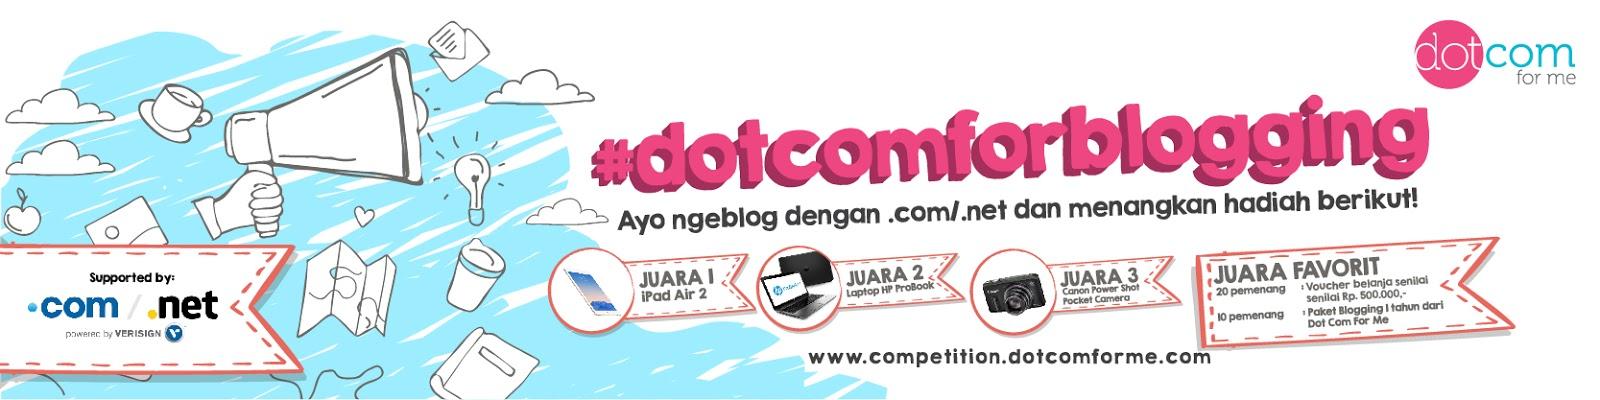 https://competition.dotcomforme.com